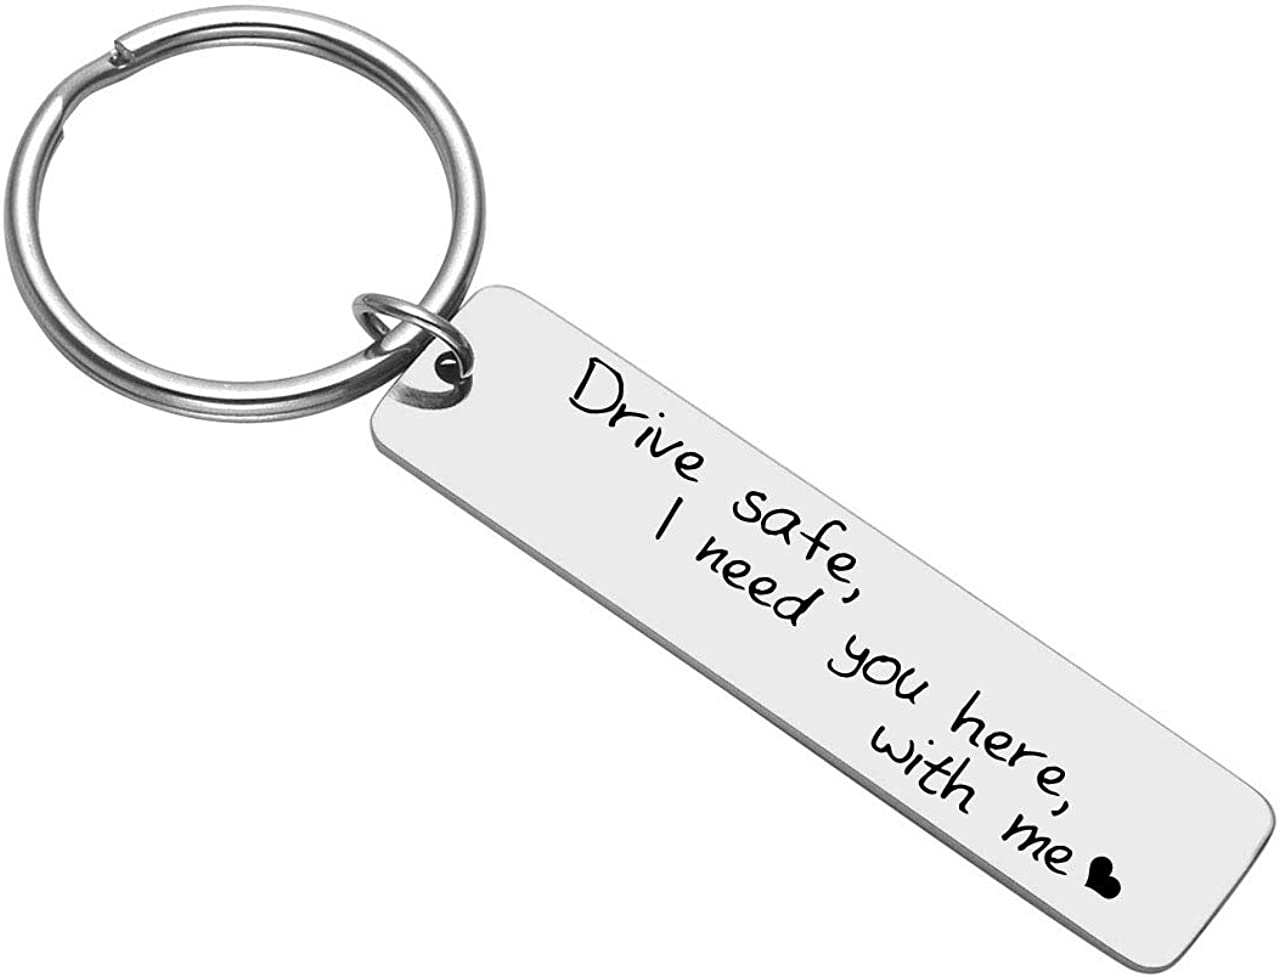 Jovivi Edelstahl Schl/üsselanh/änger mit Gravur Drive Safe I Need You here with me Partner Familie Schl/üsselring Keychain